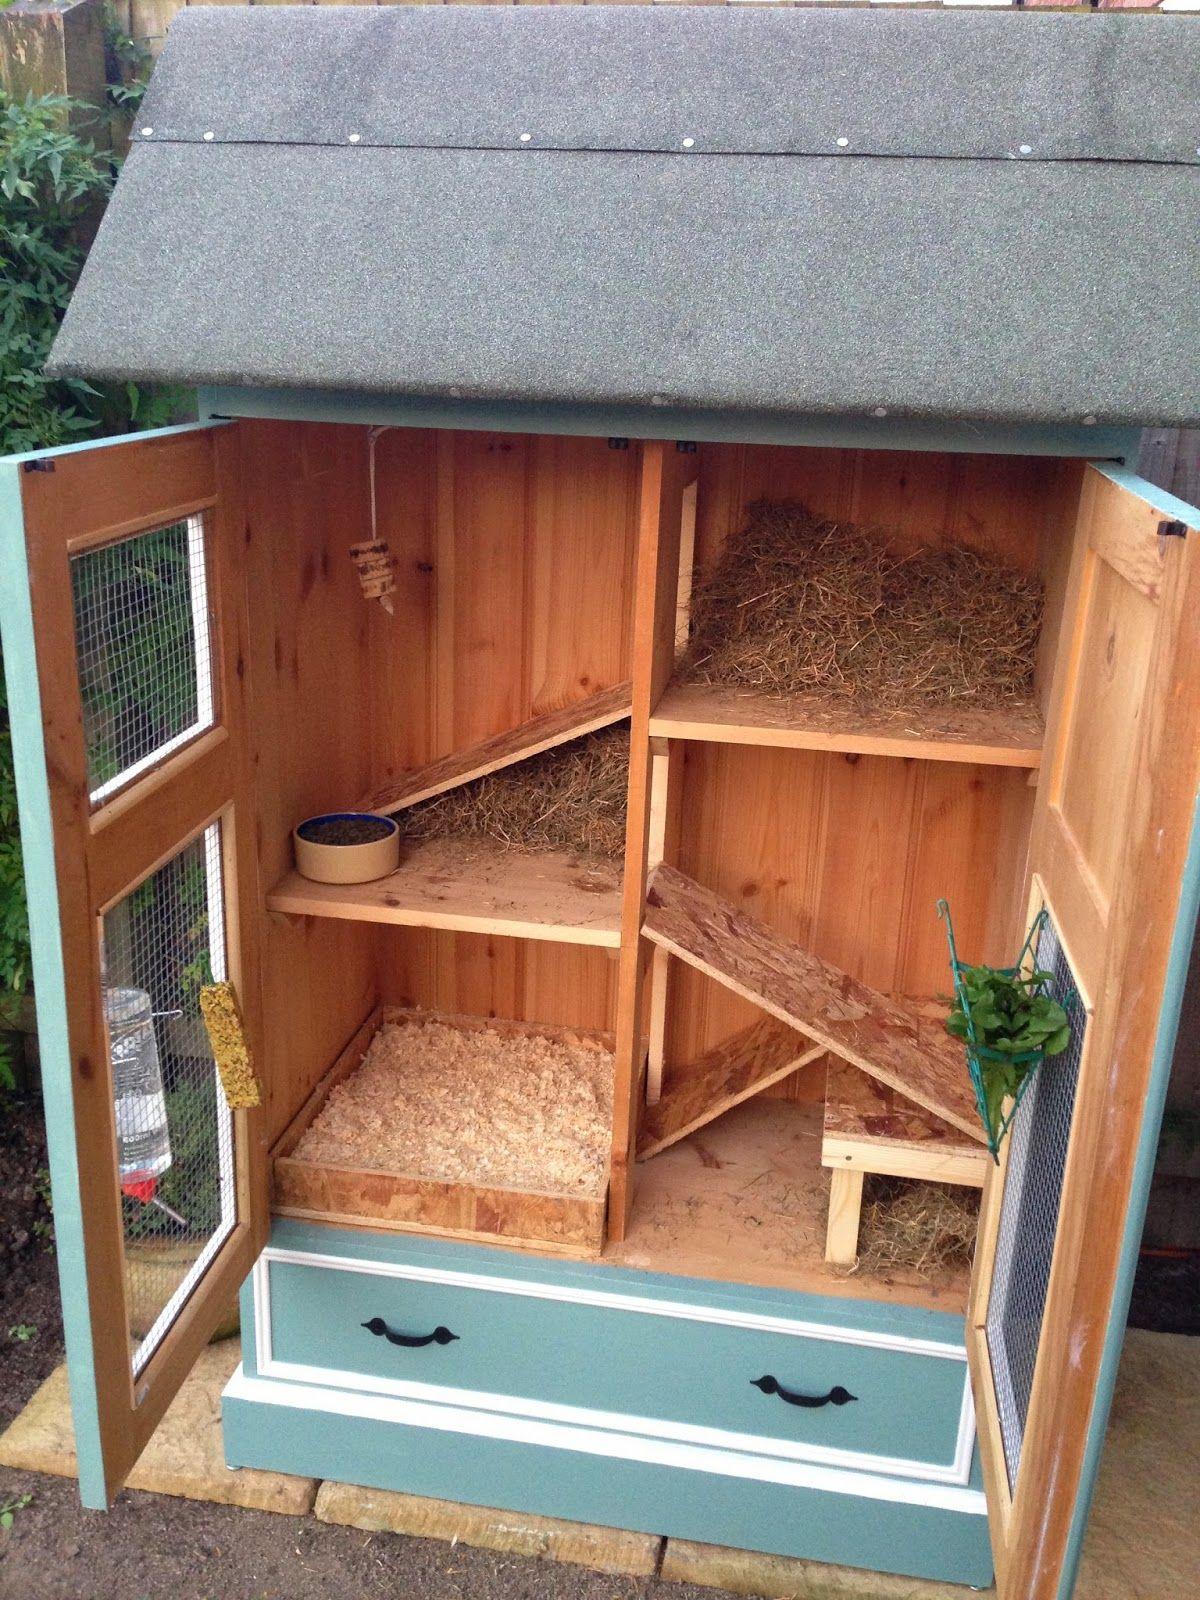 rabbit hutch coop itm for and hutches aleko ebay hen res chicken sale handmade